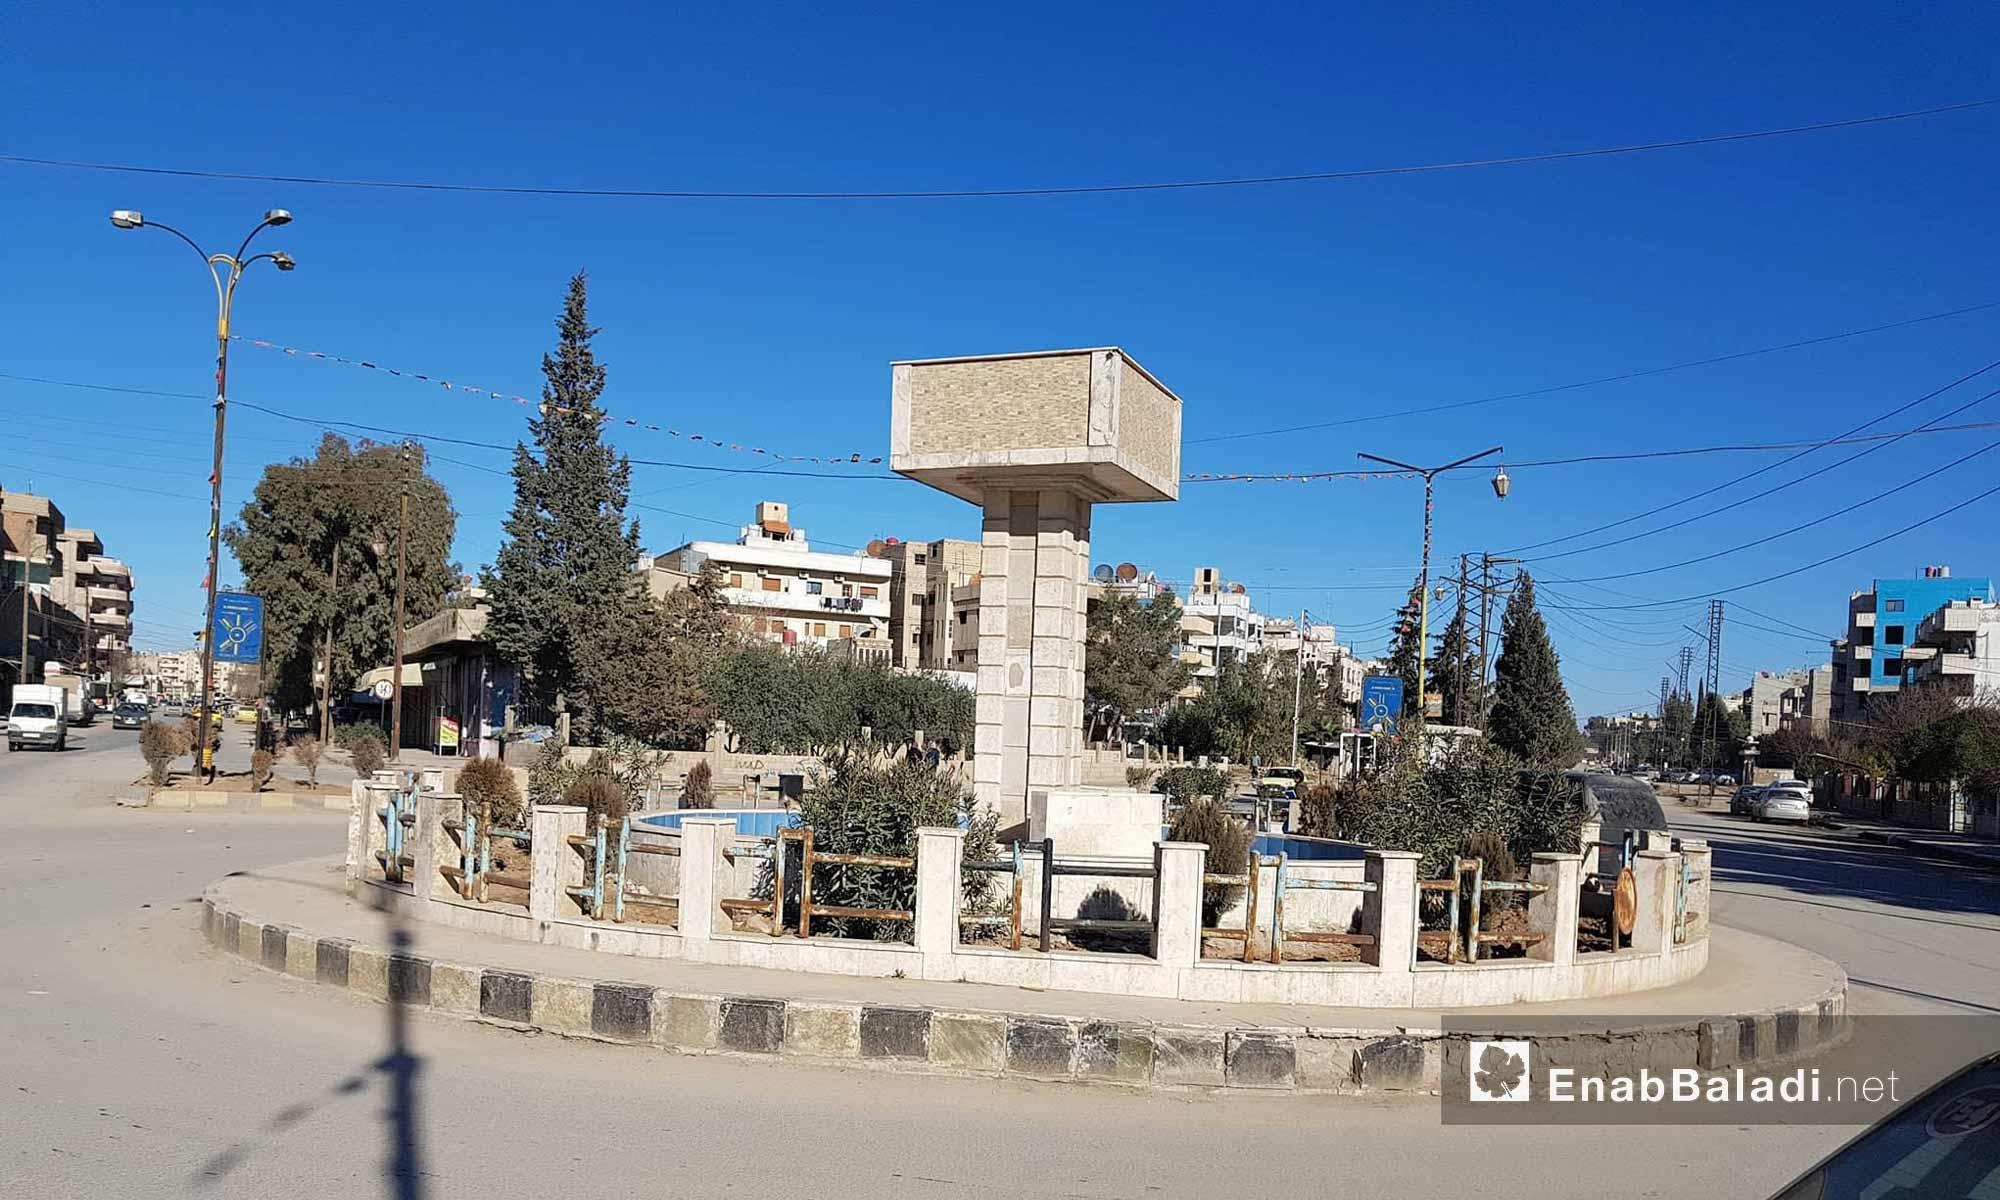 The neighborhoods of the al-Qamishli, the largest area of al-Hasakah province, north of Syria - 30 January 2018 (Enab Baladi)